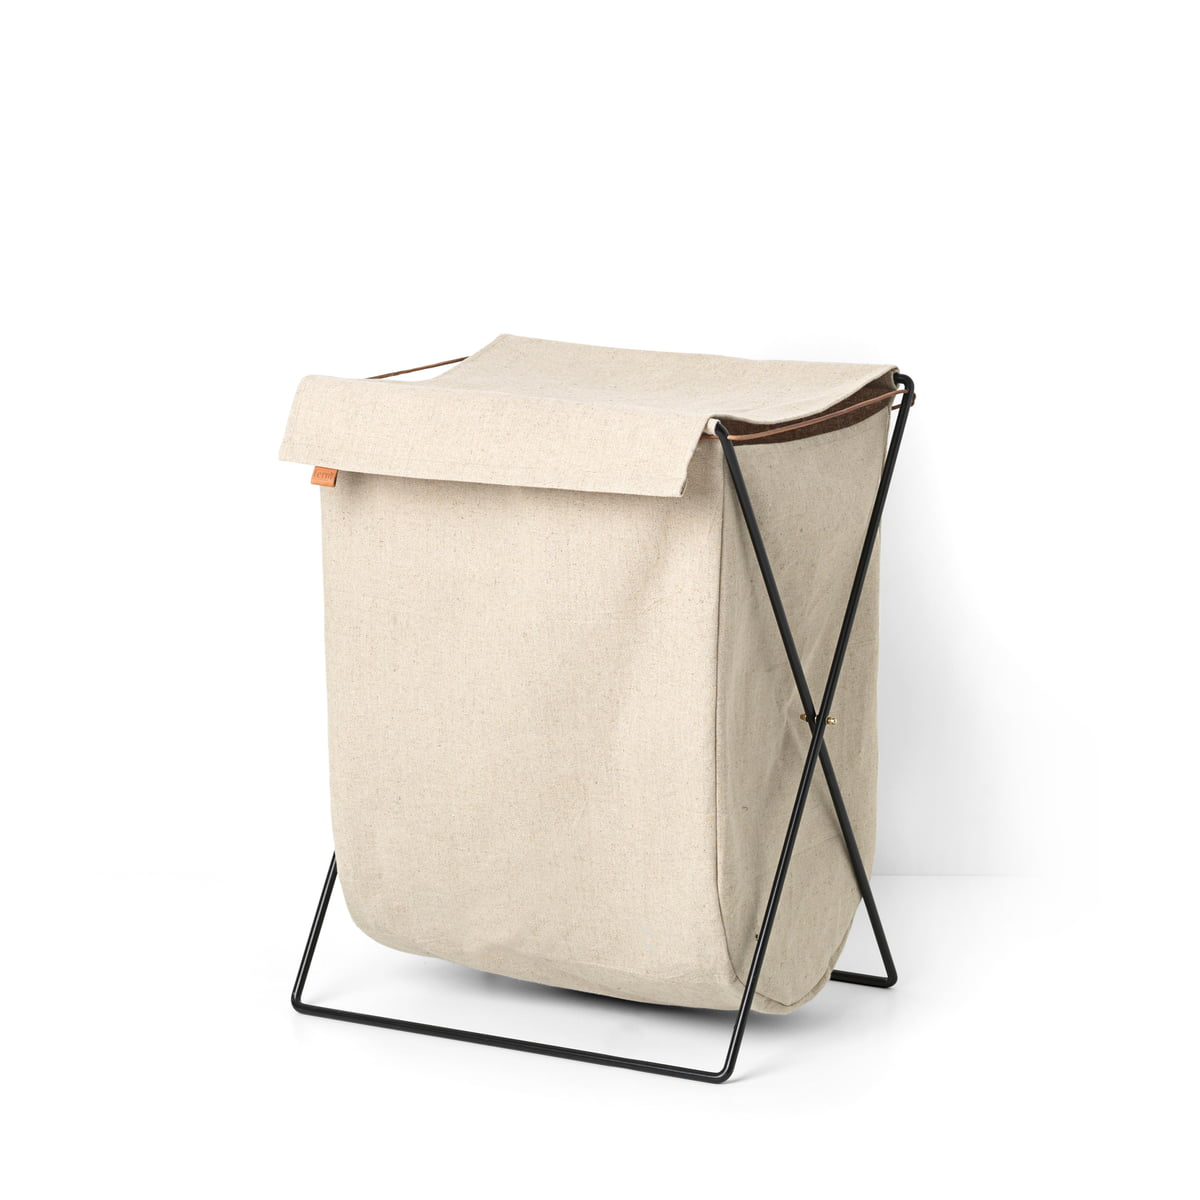 Ferm Living Herman Laundry Basket Connox